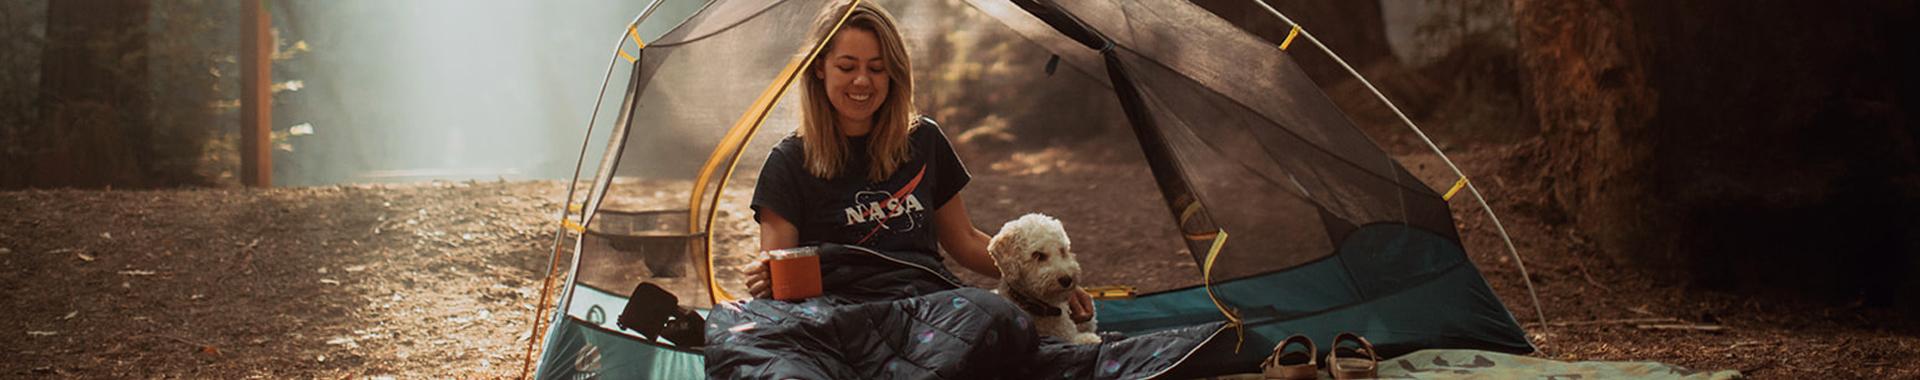 Woman sitting in Sierra Designs tent